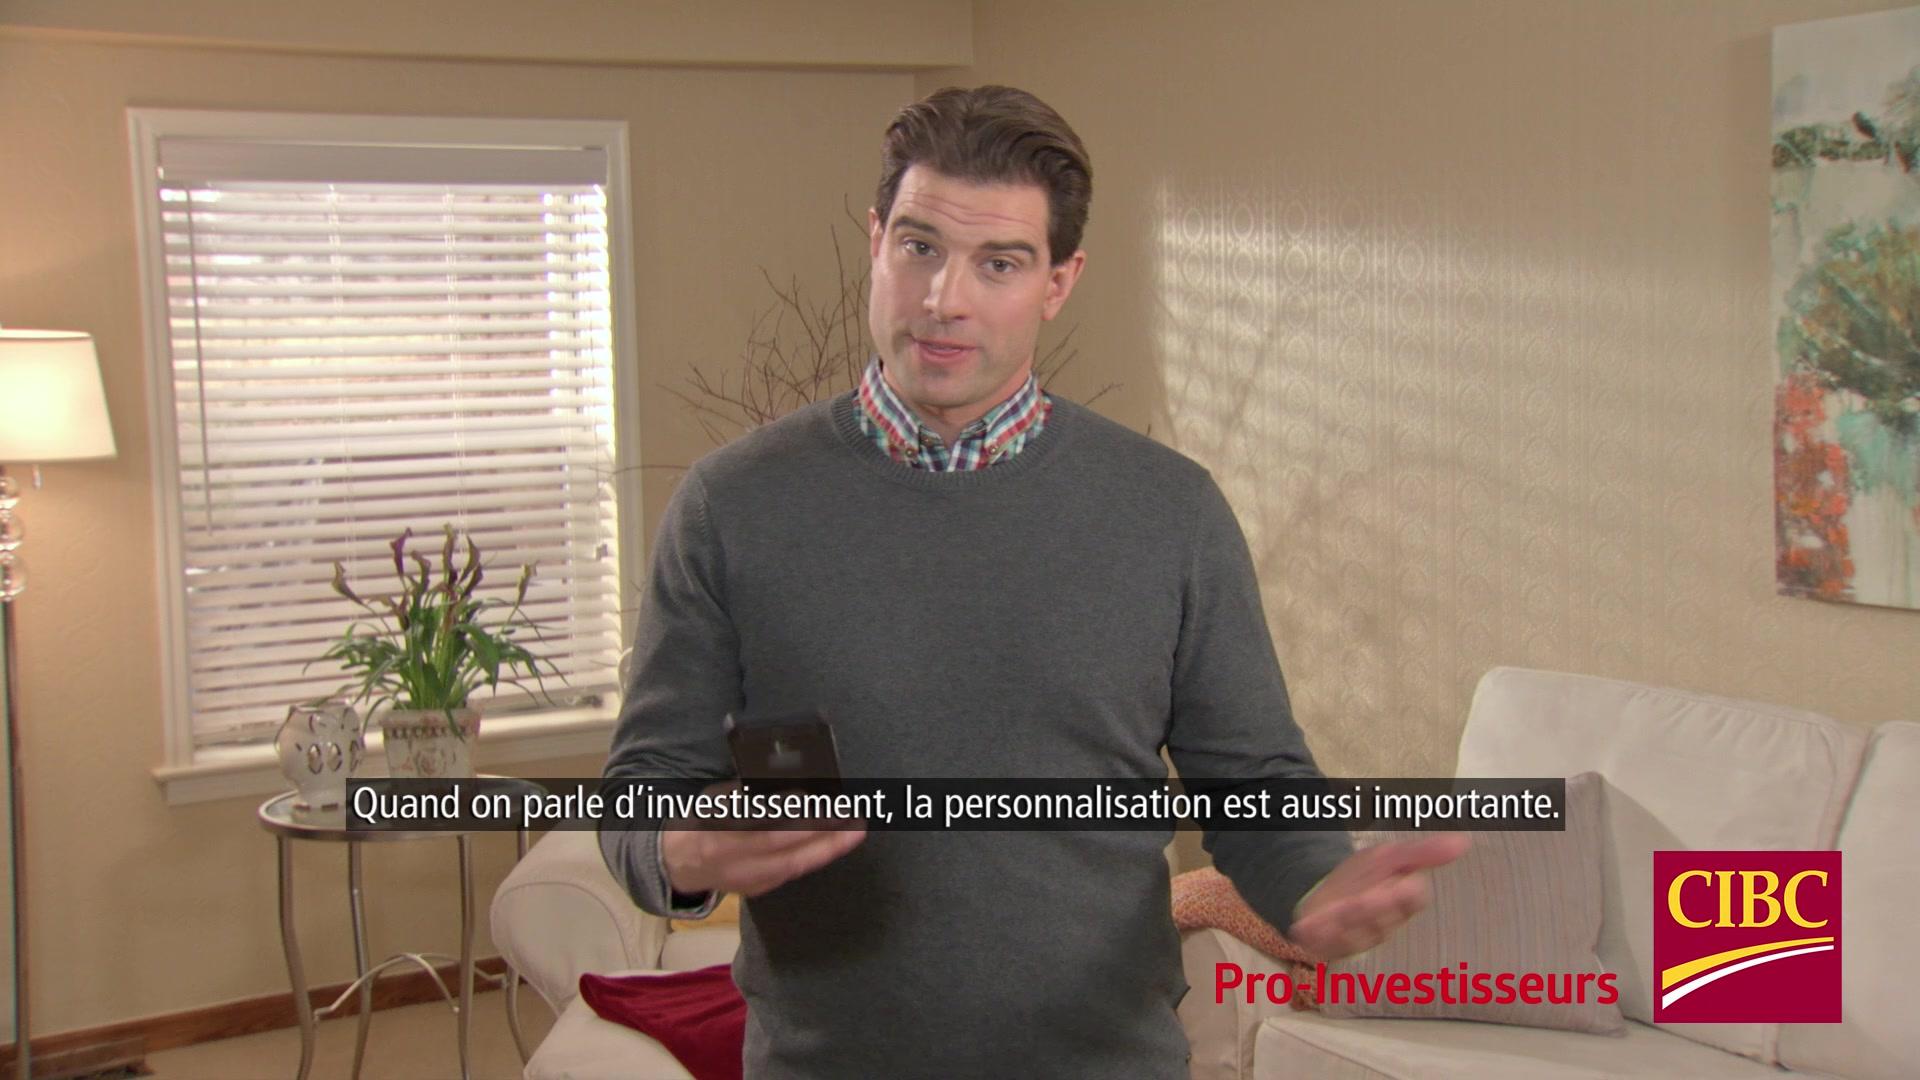 20931_FR_CIBC_Investors Edge_Episode 2 - Personalization_FINAL_Video ID-21093